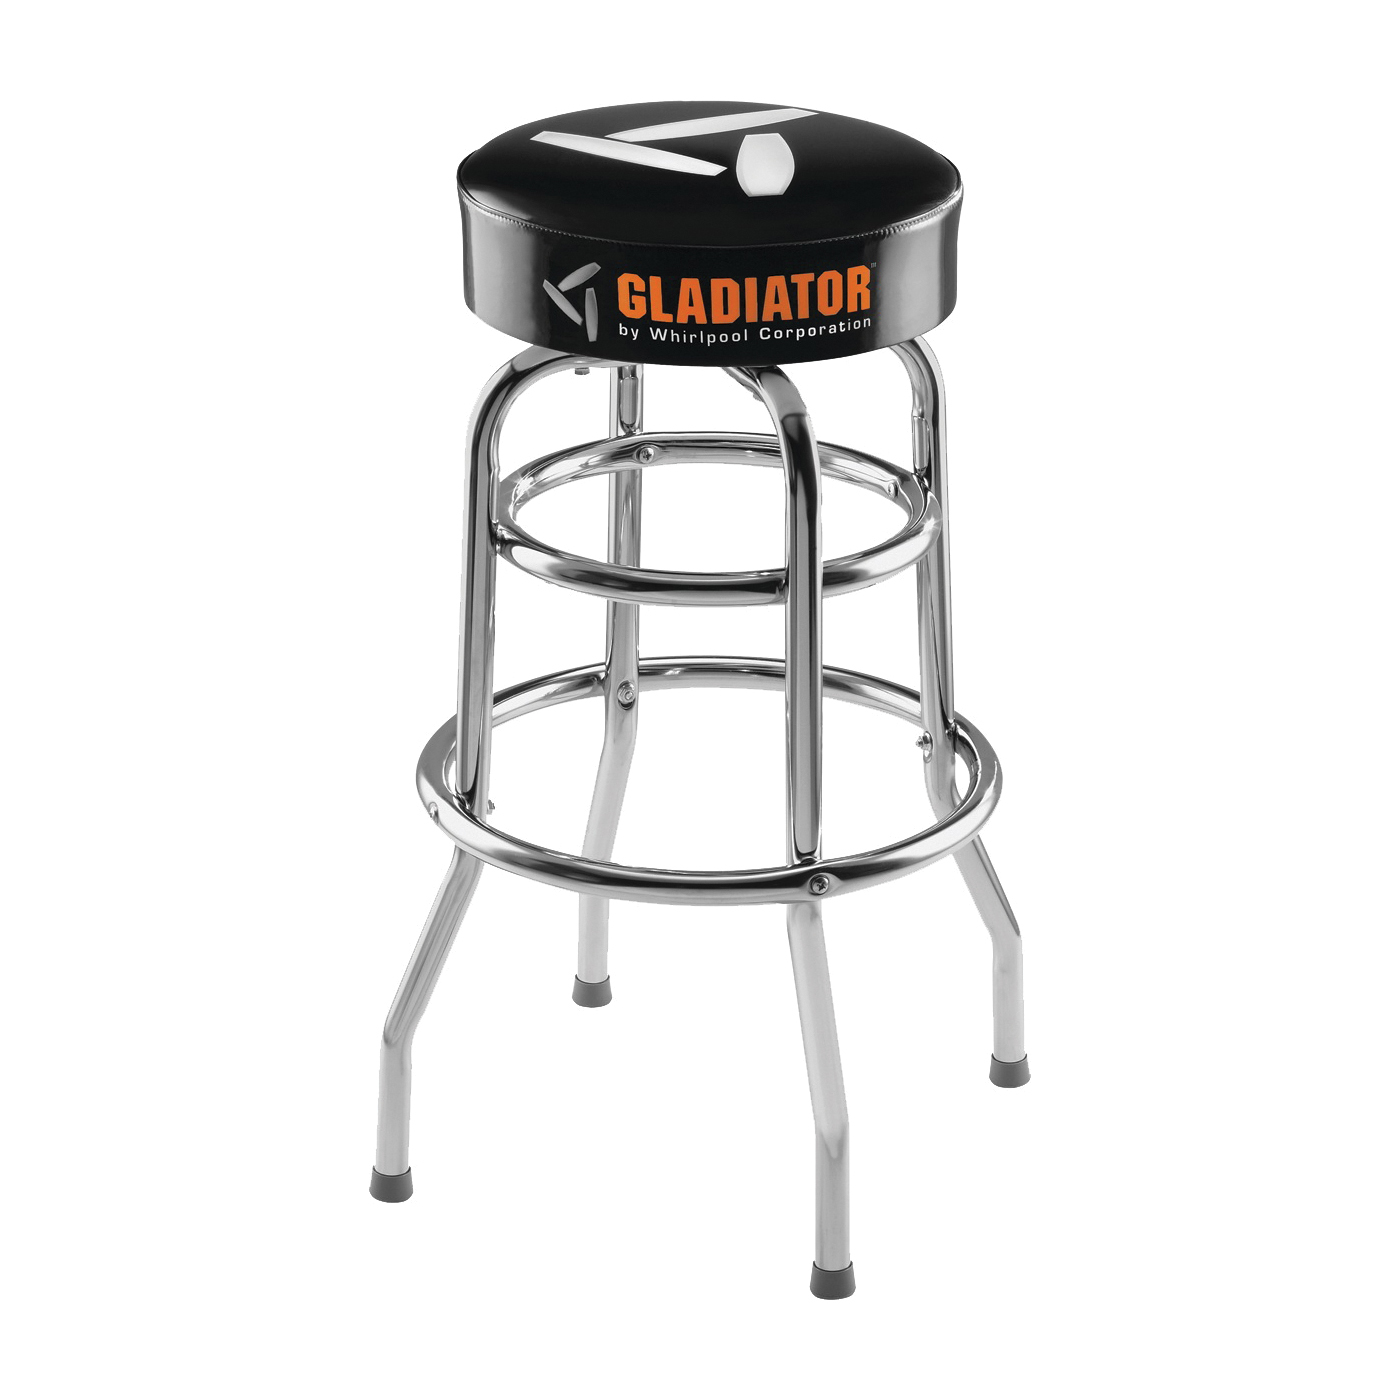 Picture of GLADIATOR GAAC30STJB Workbench Stool, 15 in OAW, 30 in OAH, 300 lb Capacity, Black